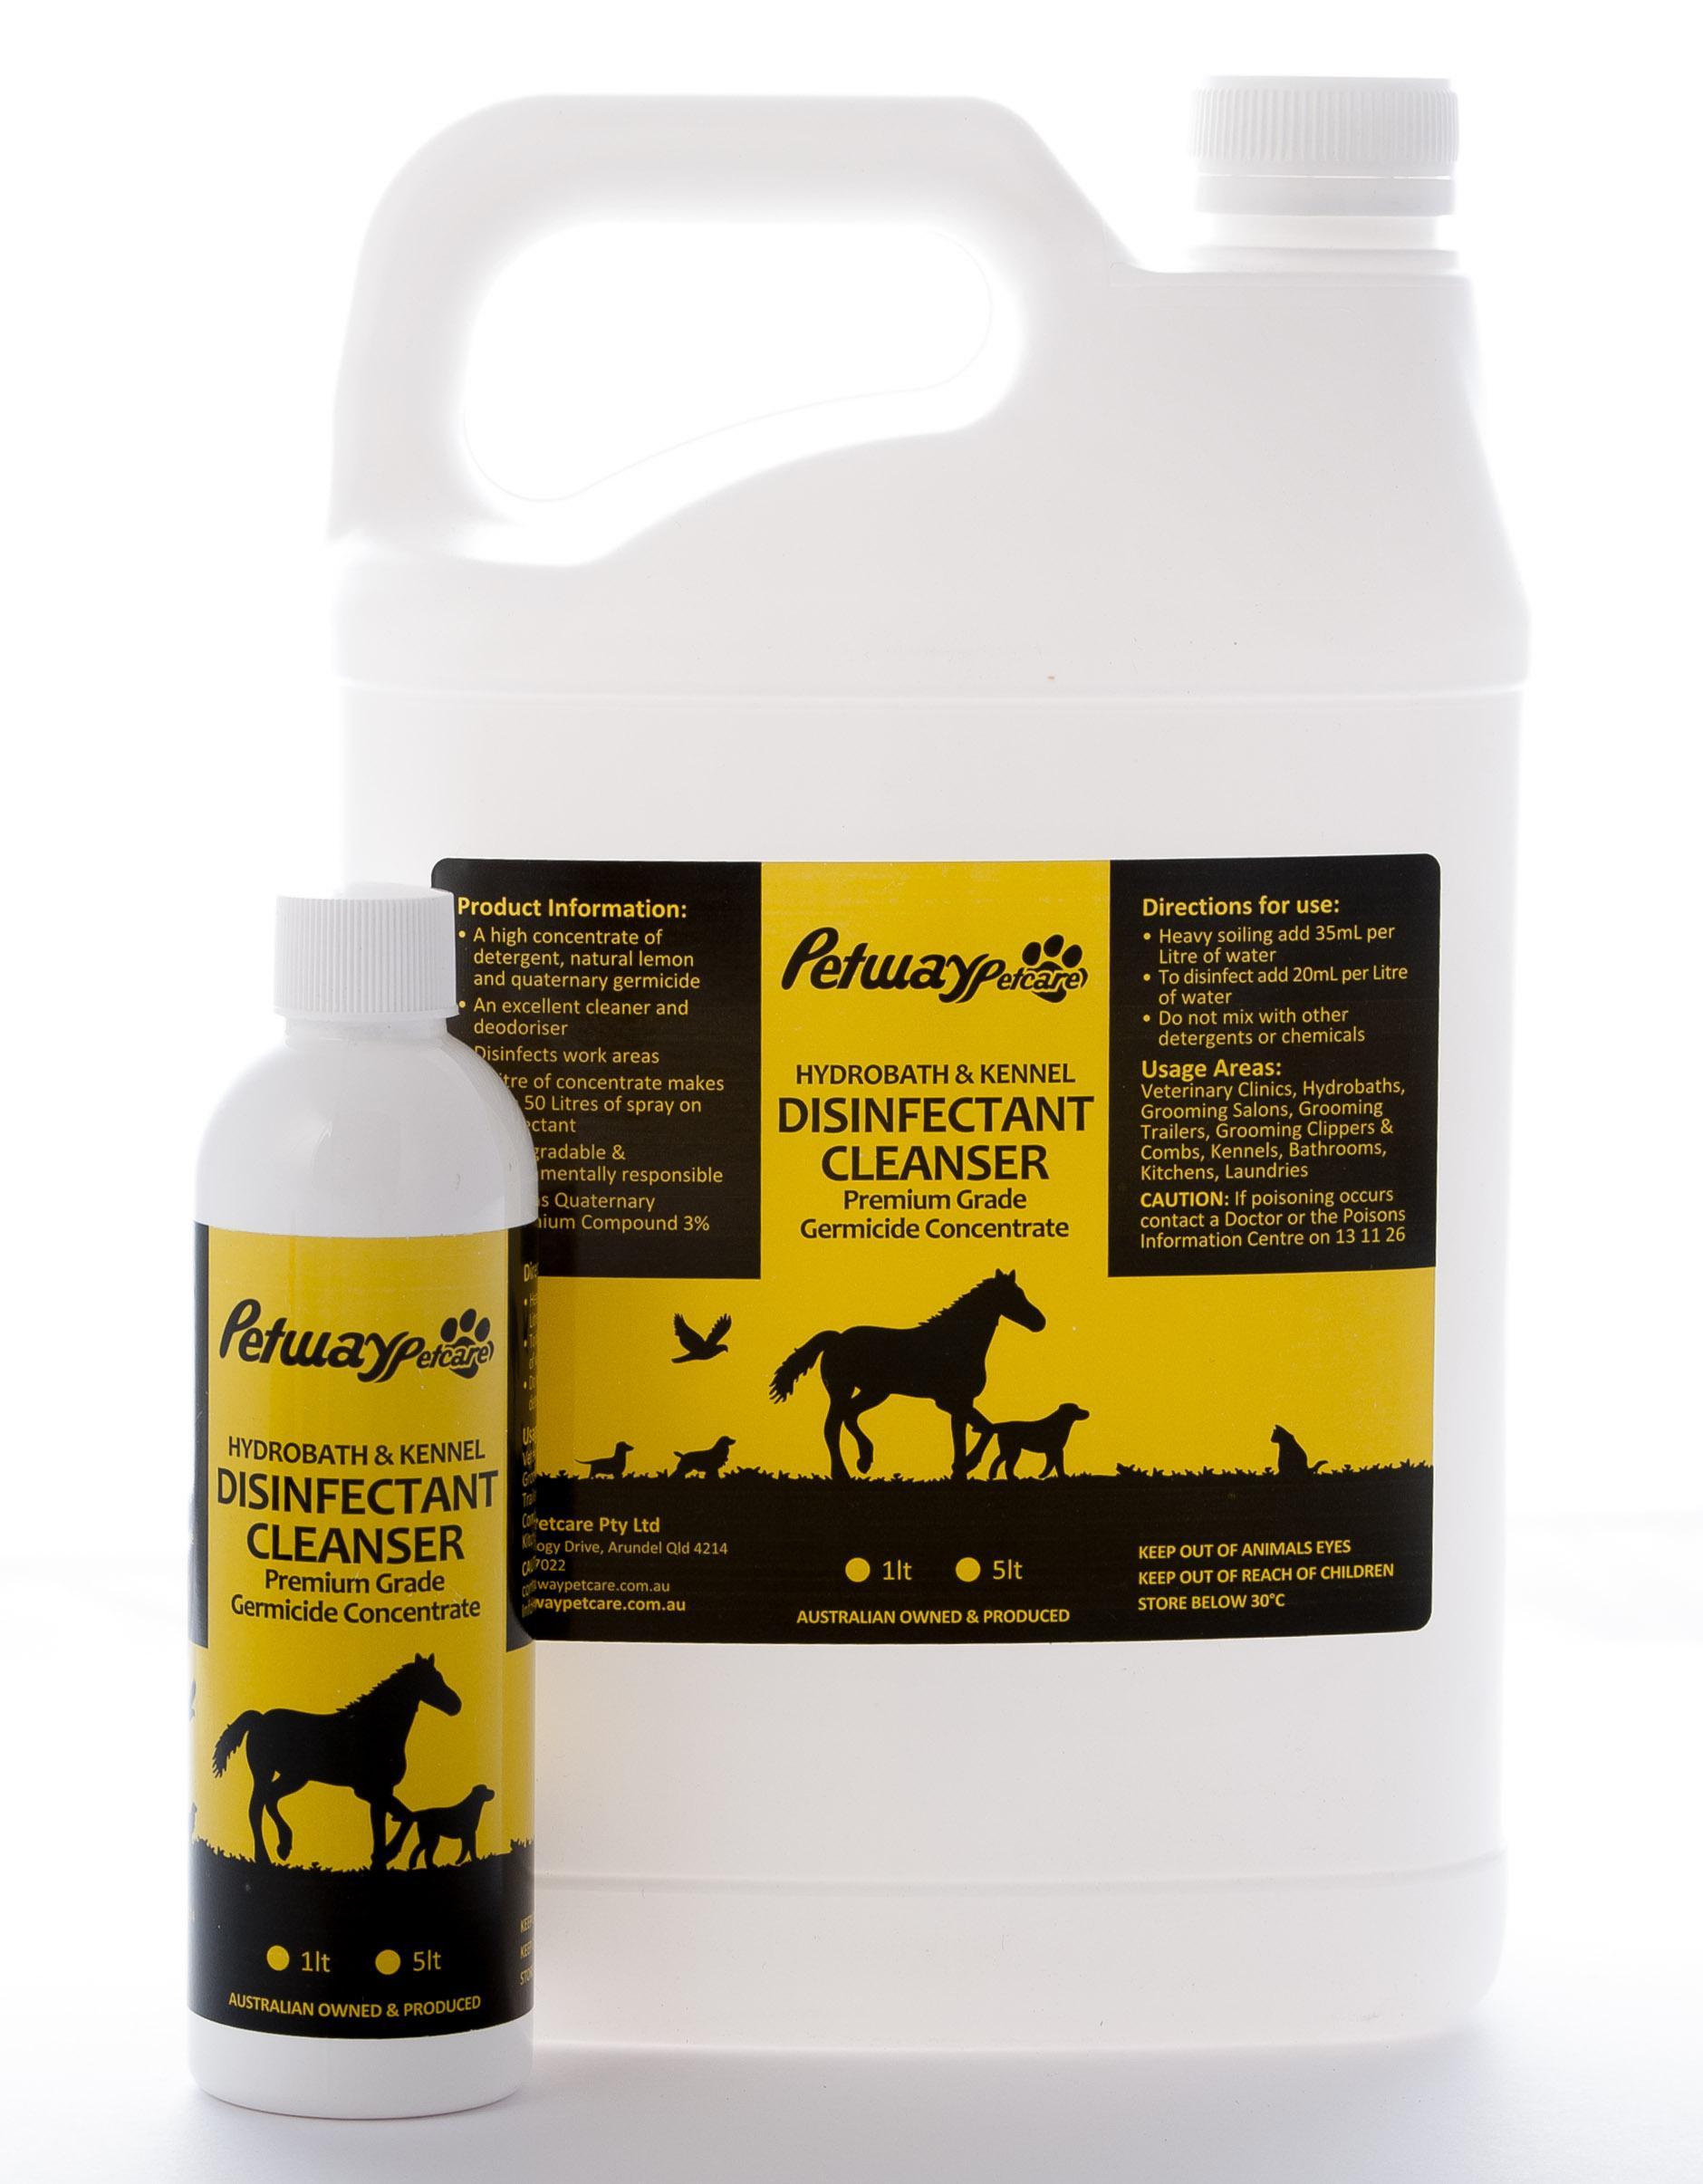 Petway Disinfectant Cleanser 5L